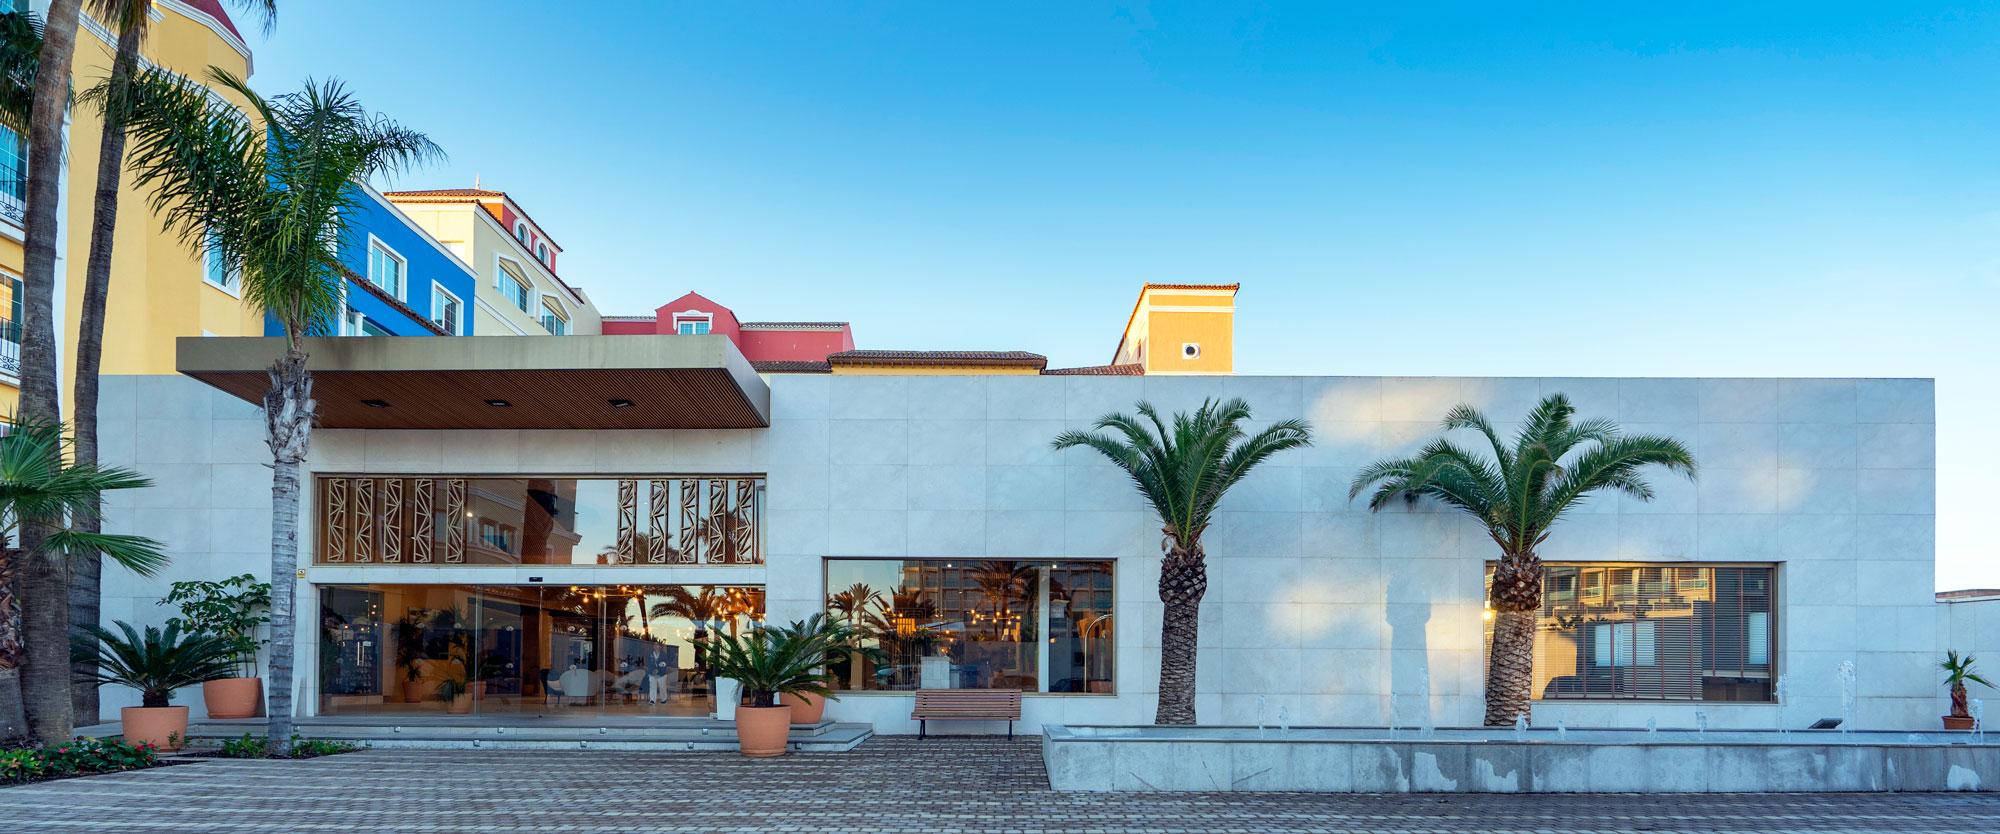 Hotel Mediterráneo  - Hotel Mediterraneo Park 2 Dekton Silestone Piedra Natural Cosentino 45